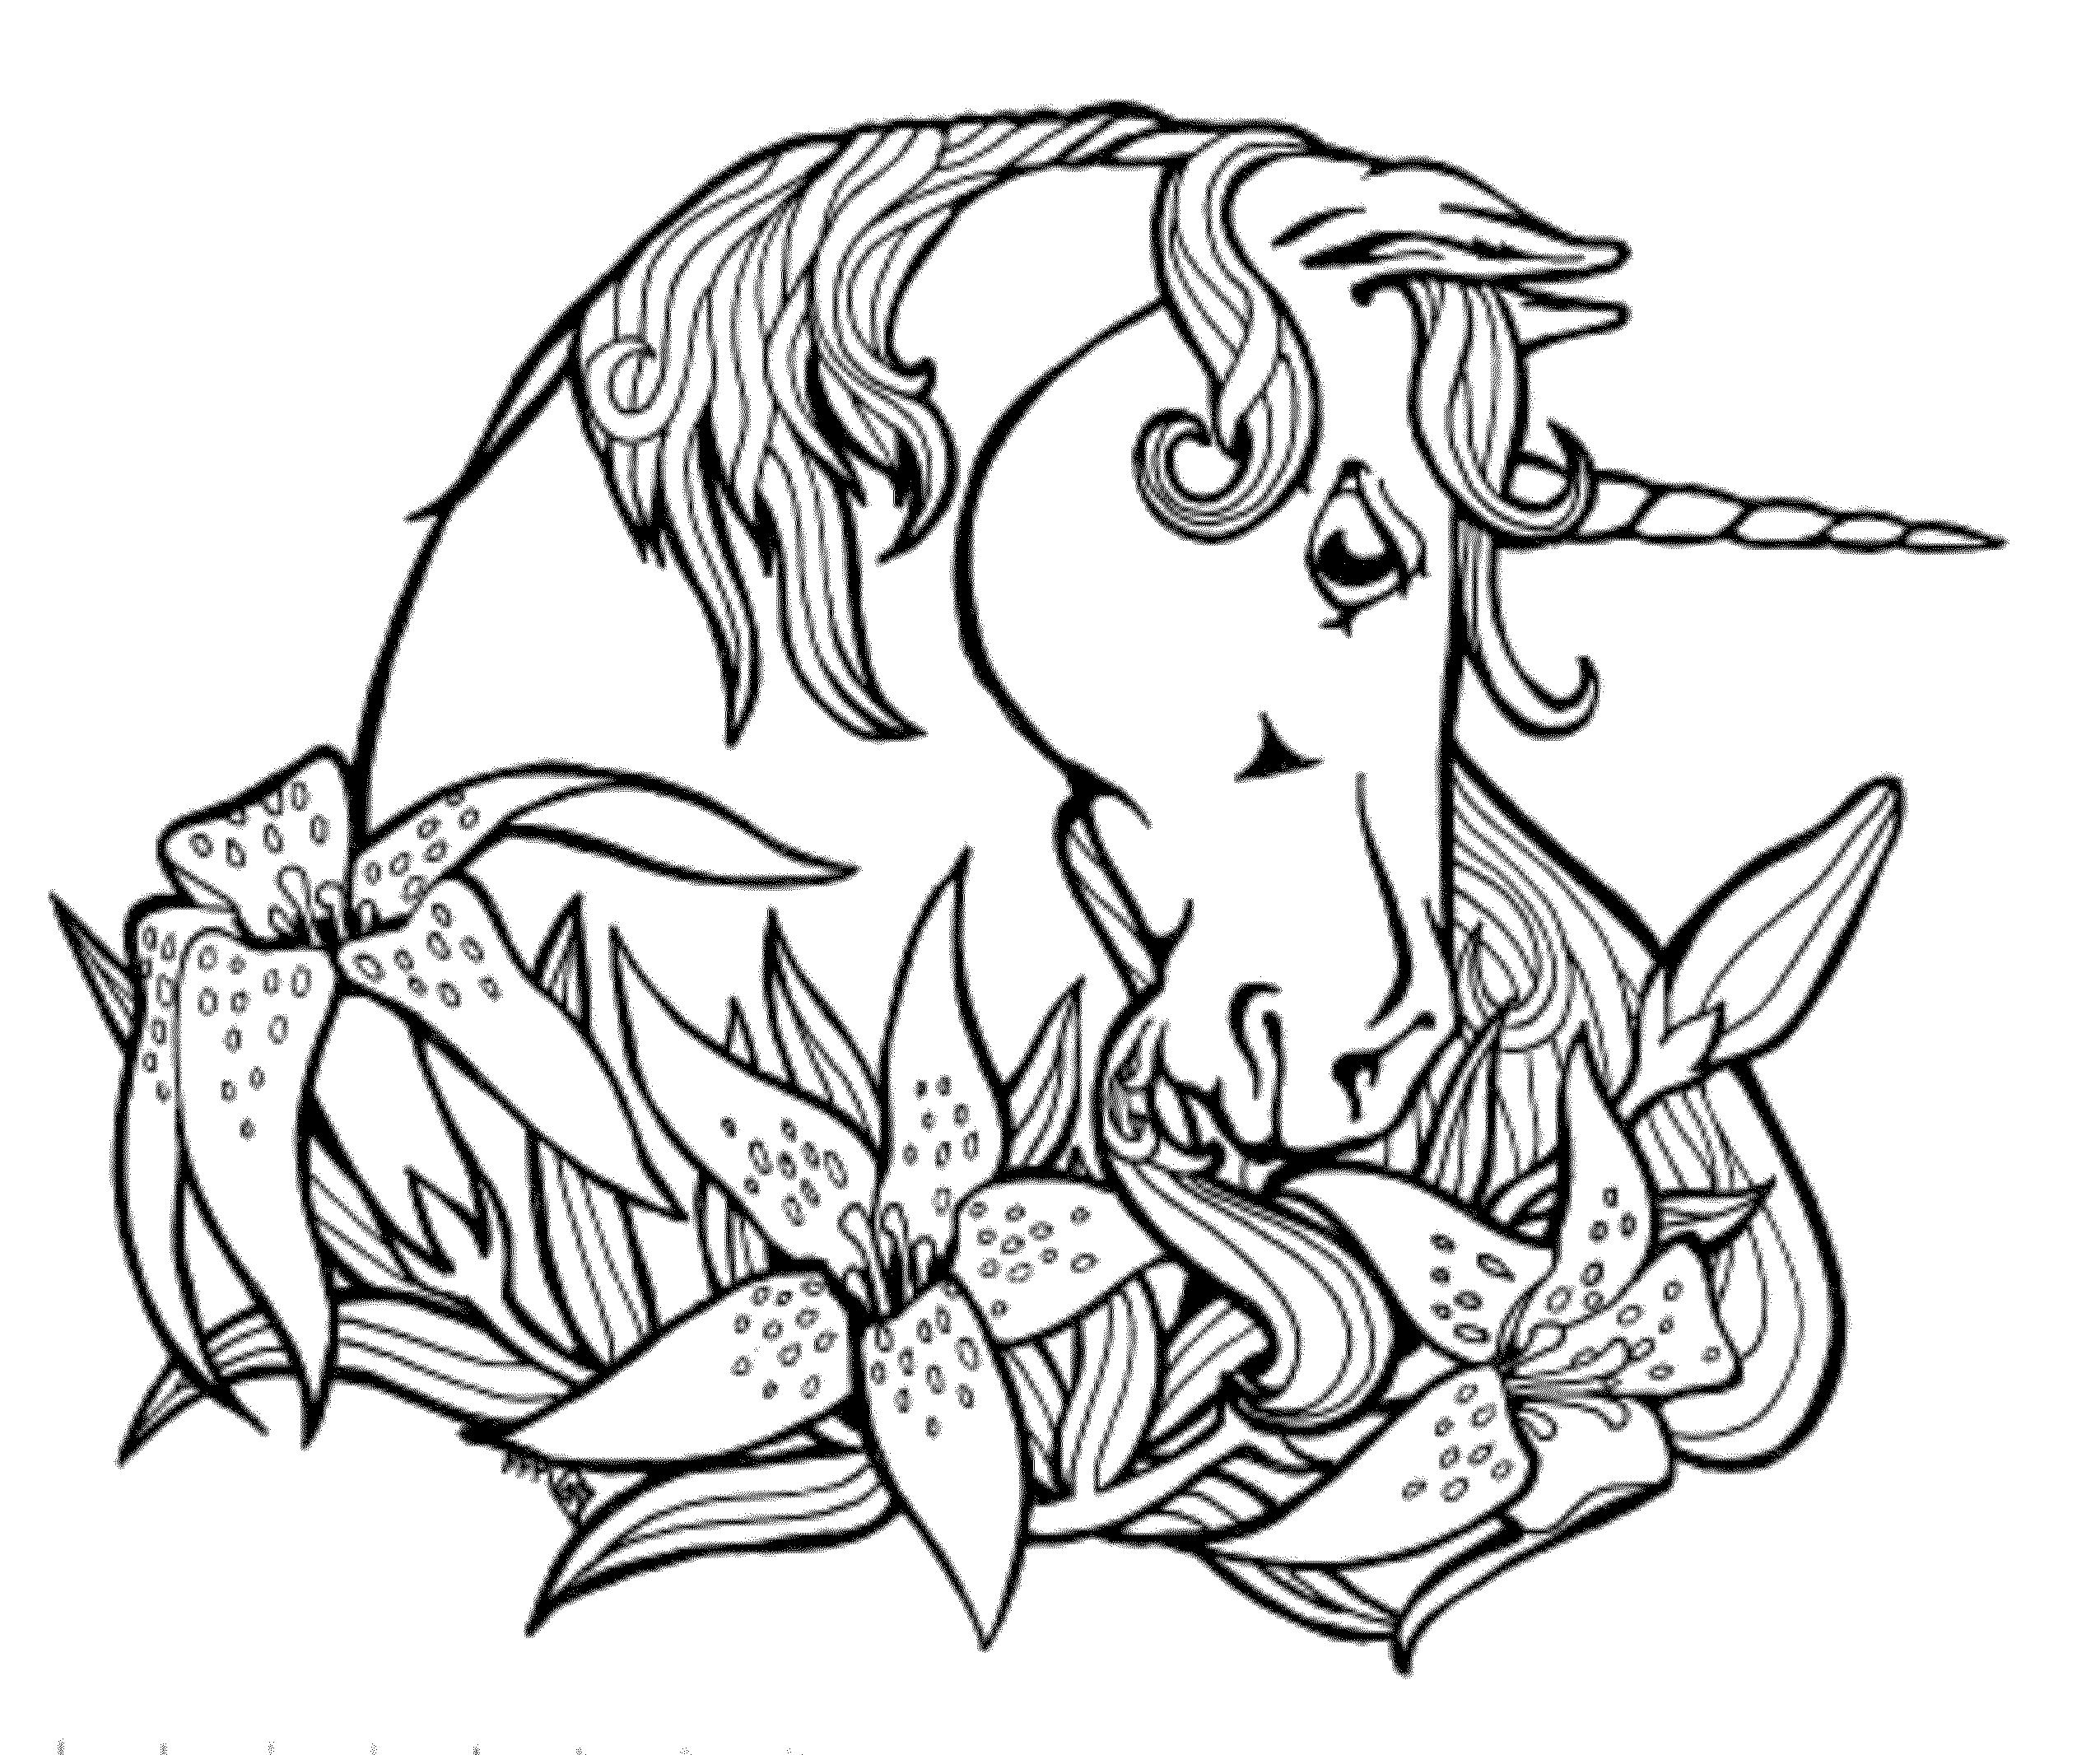 coloring page unicorn print download unicorn coloring pages for children unicorn coloring page